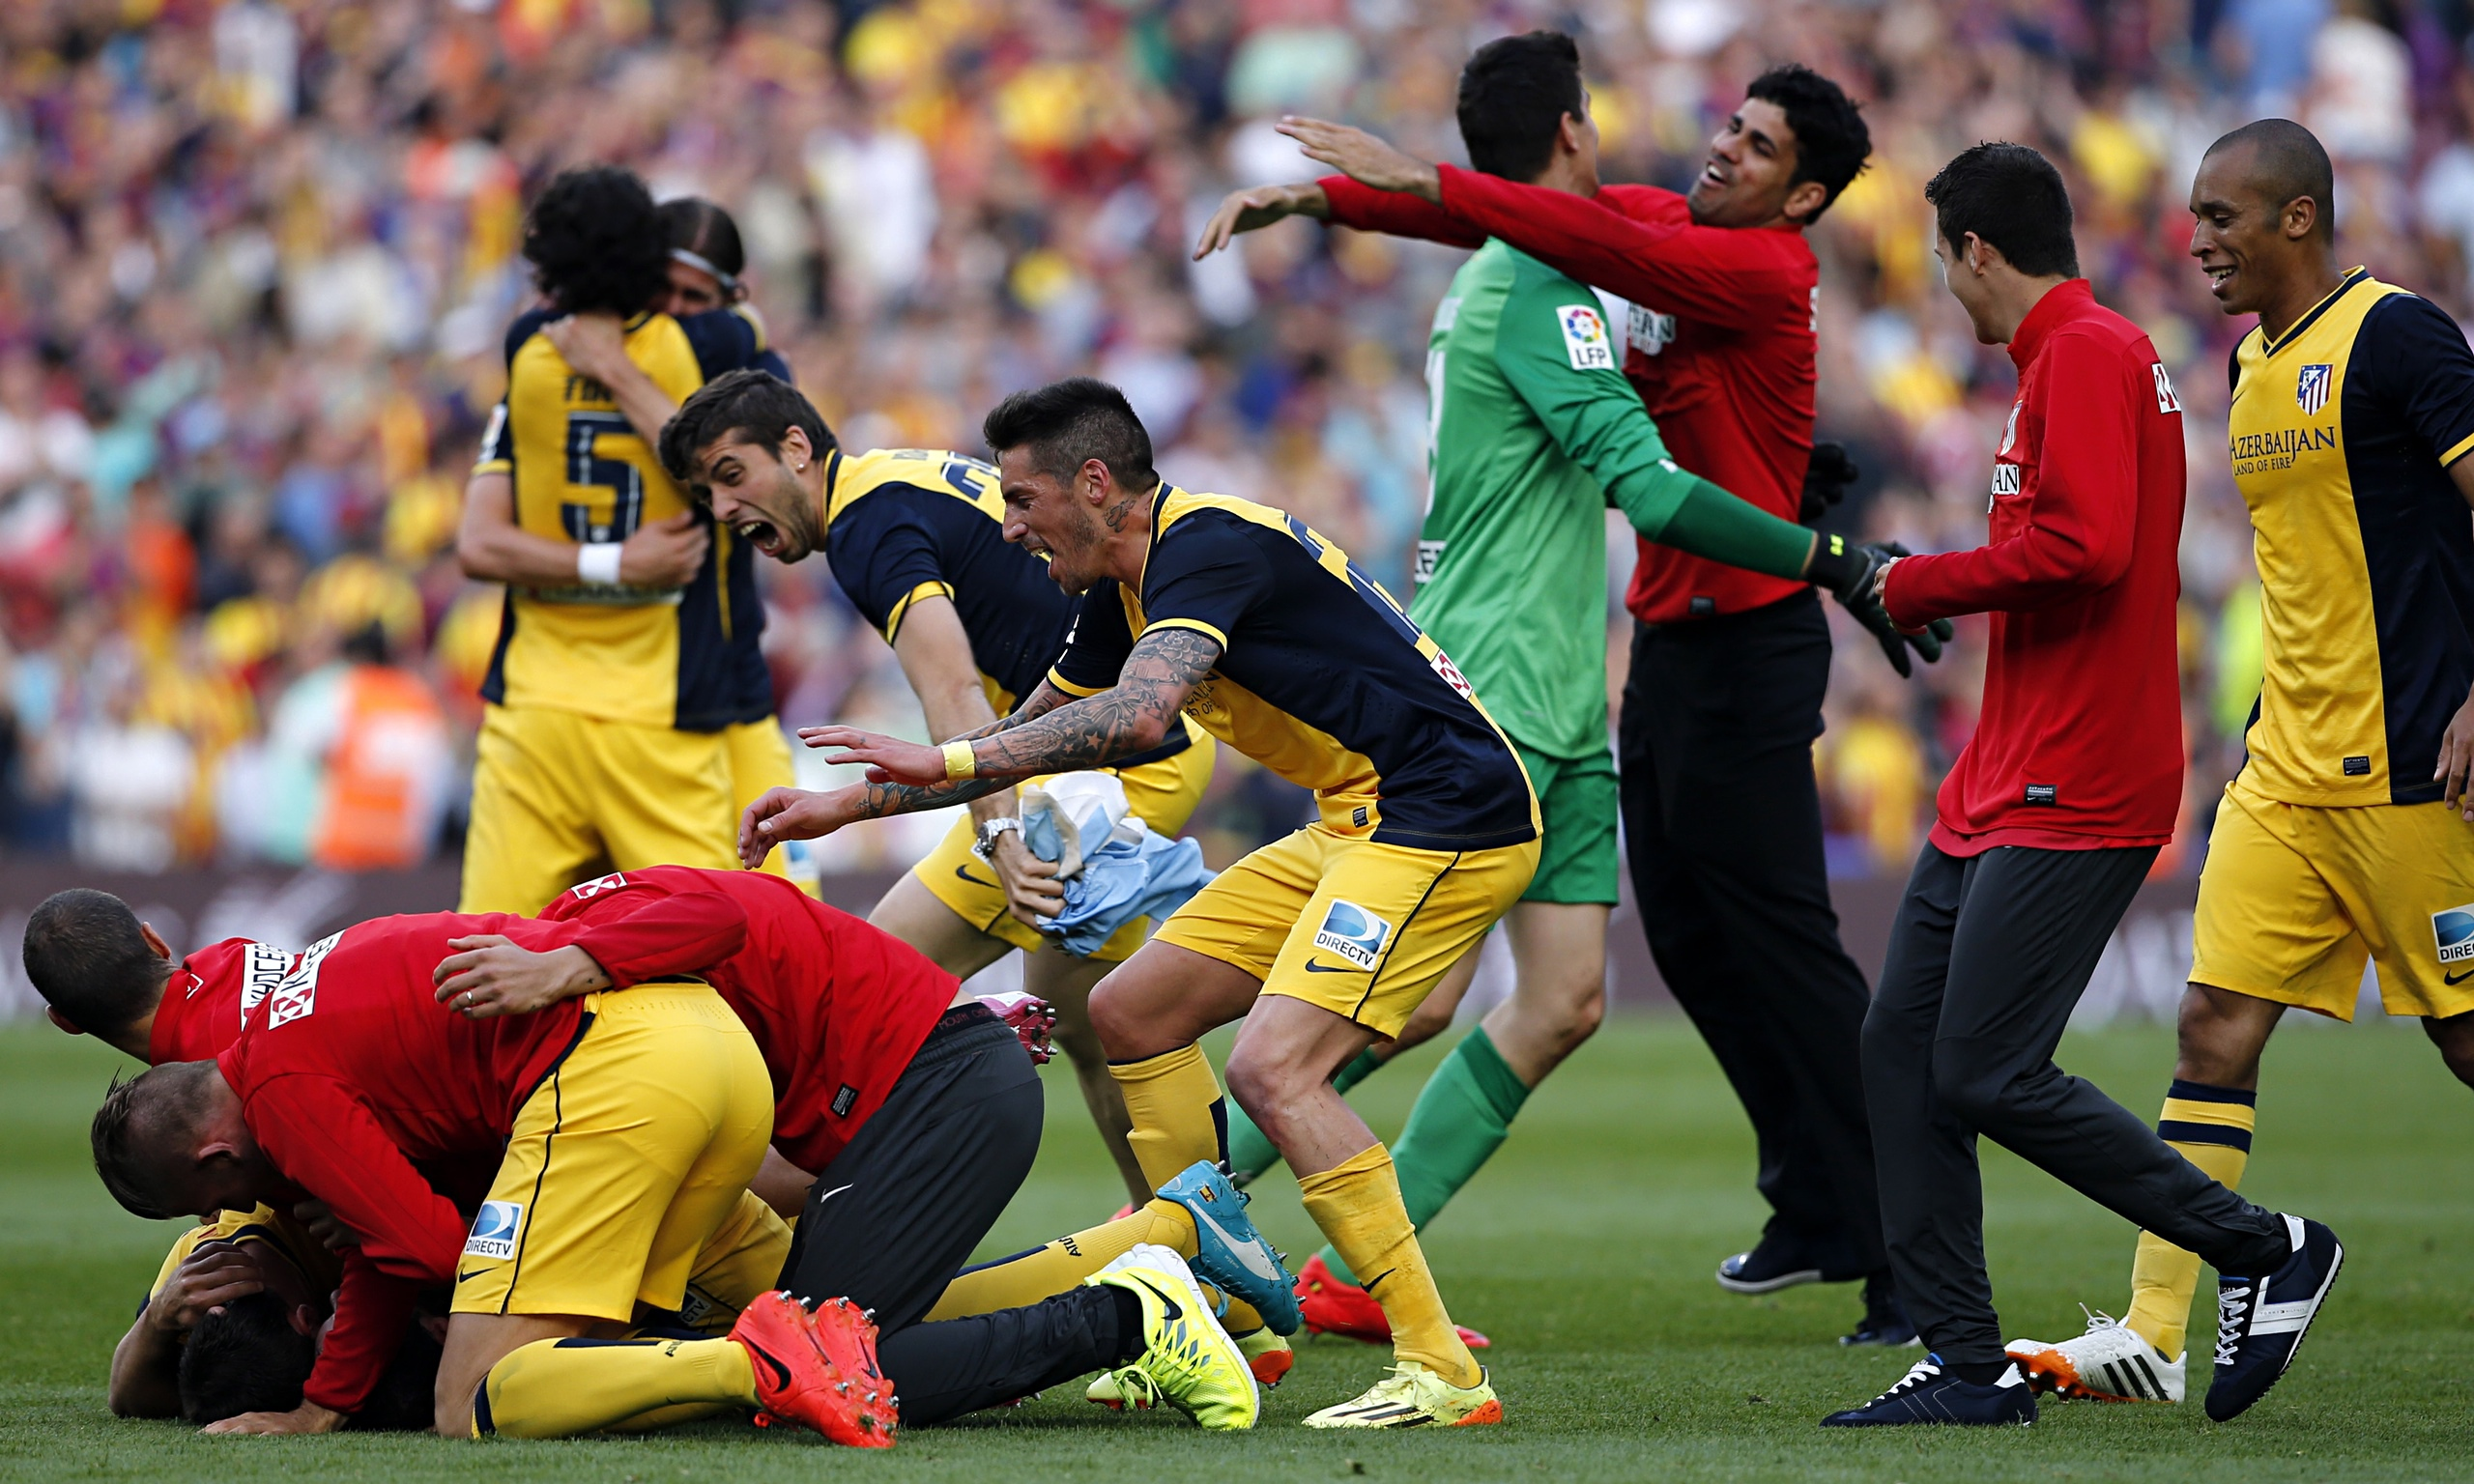 La Liga: Atlético Madrid Celebrate La Liga Title After Draw At